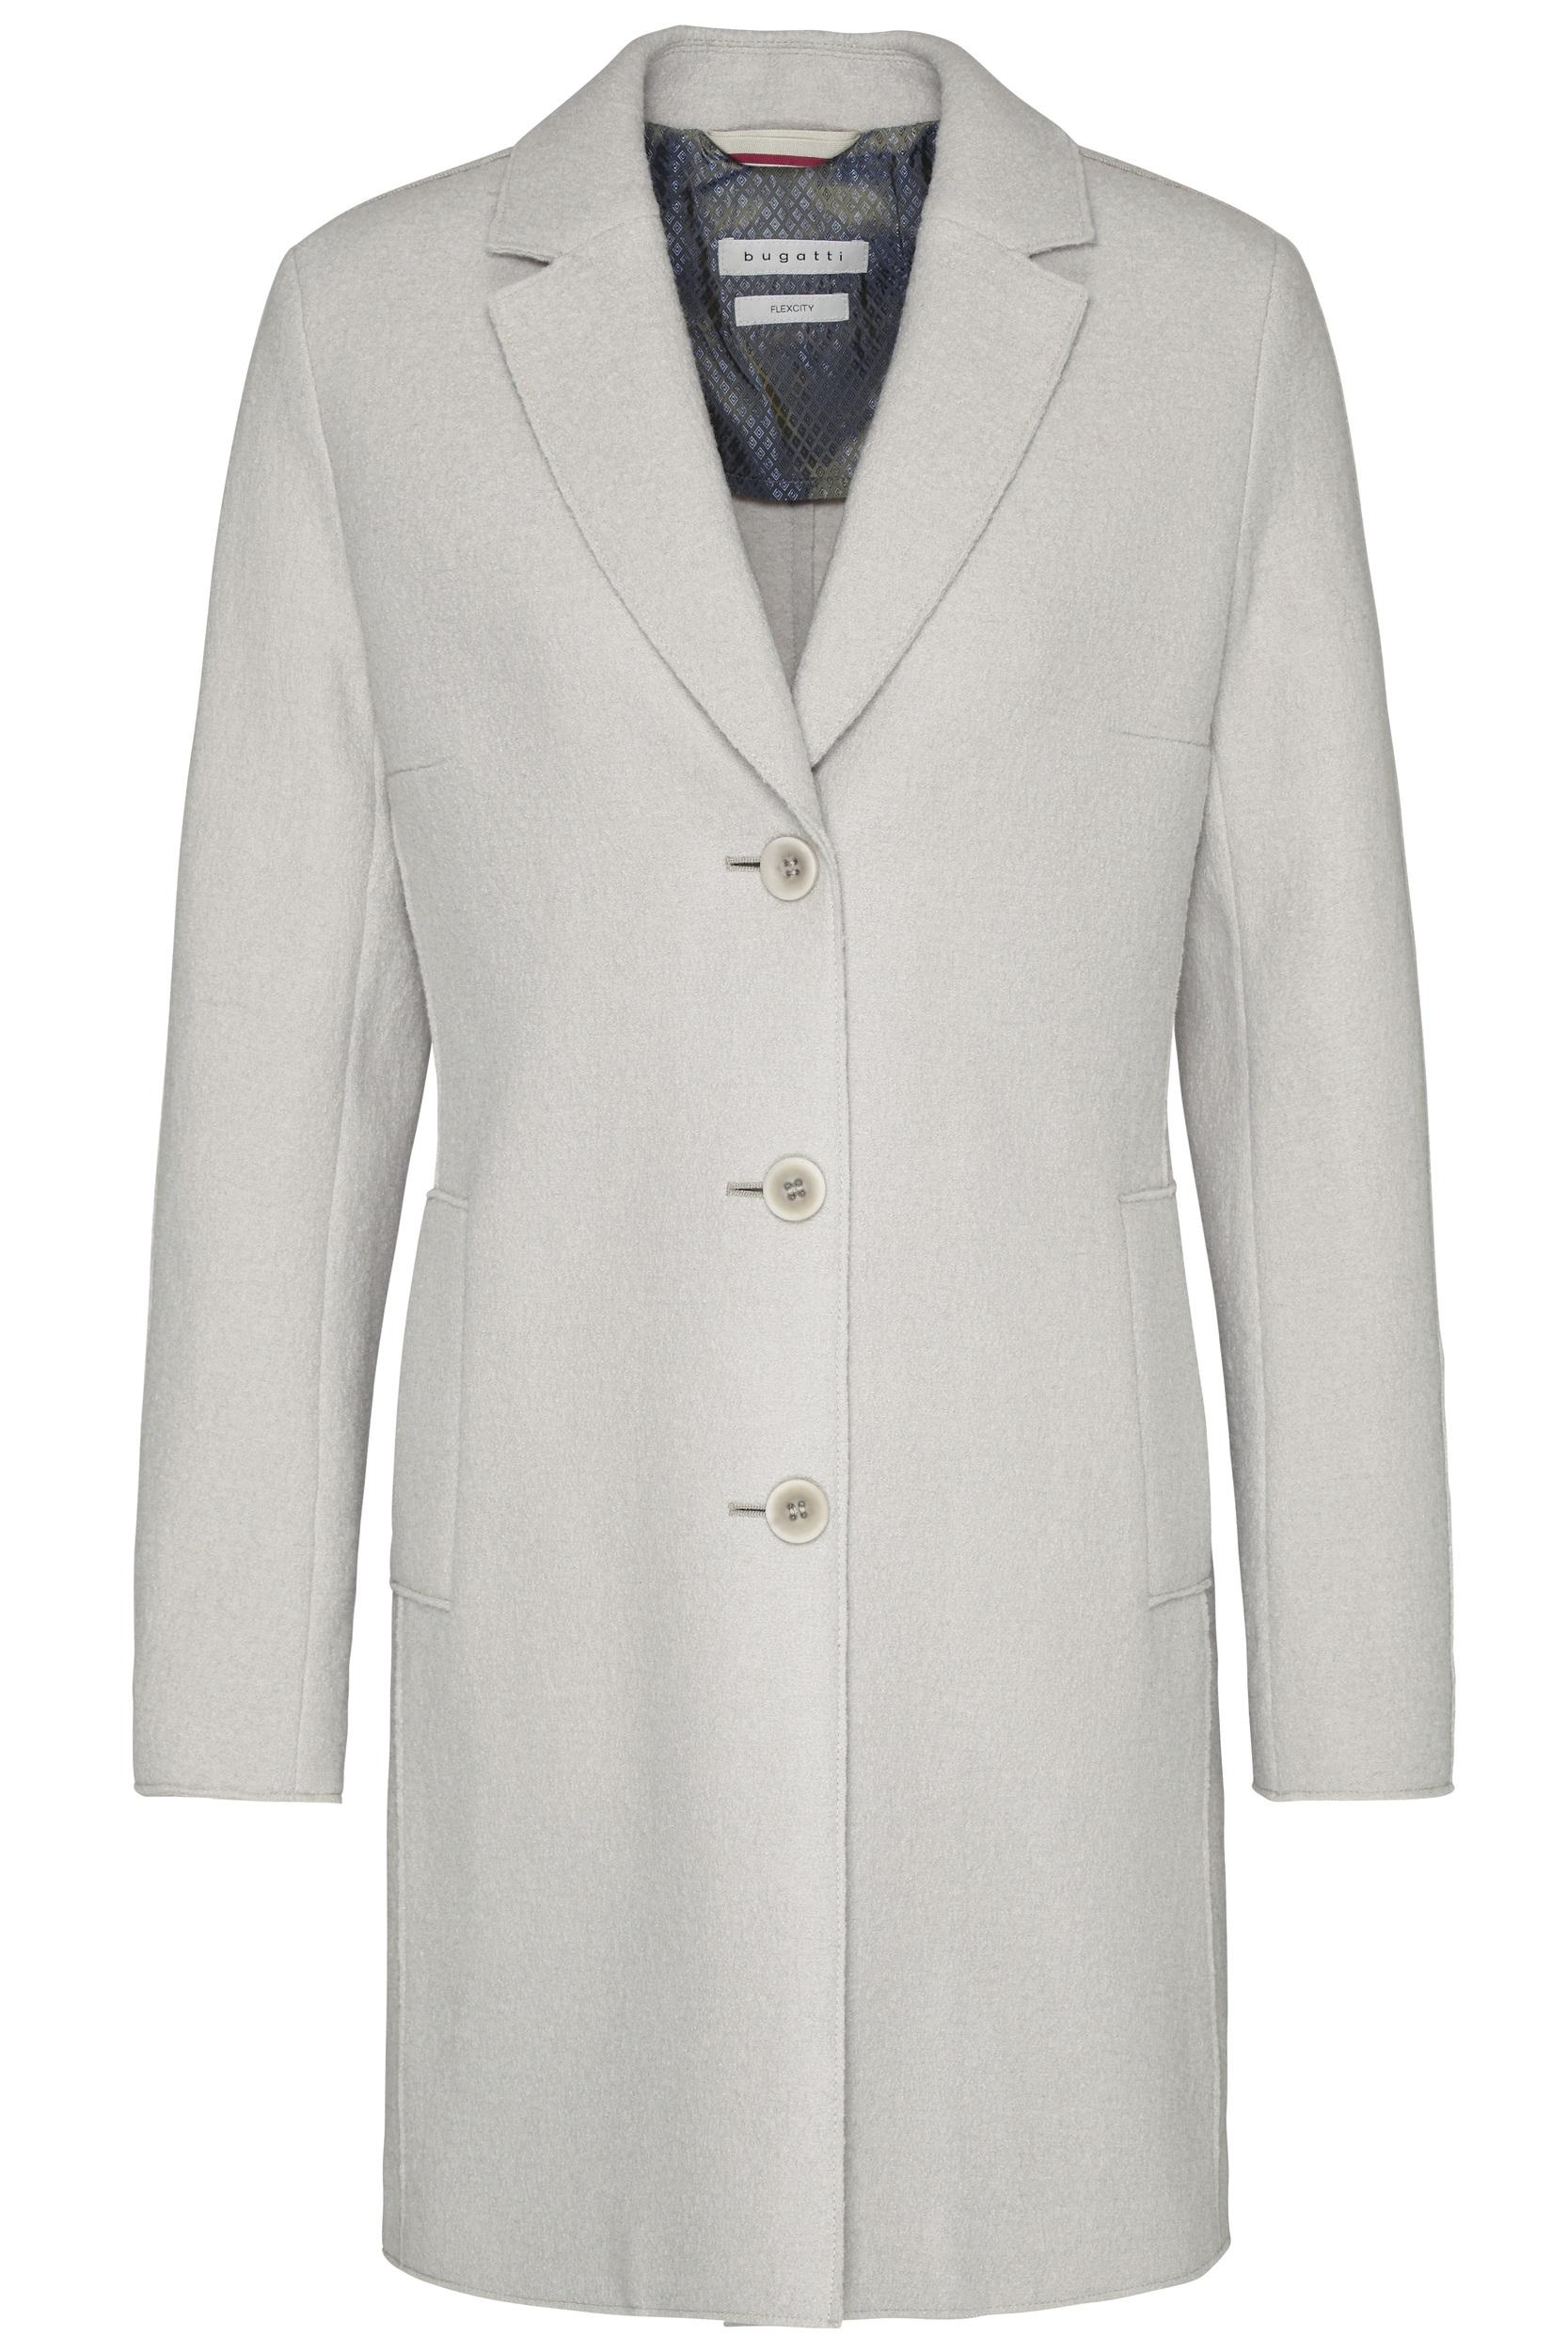 Bugatti dámský kabát 64088/30 Šedá 36